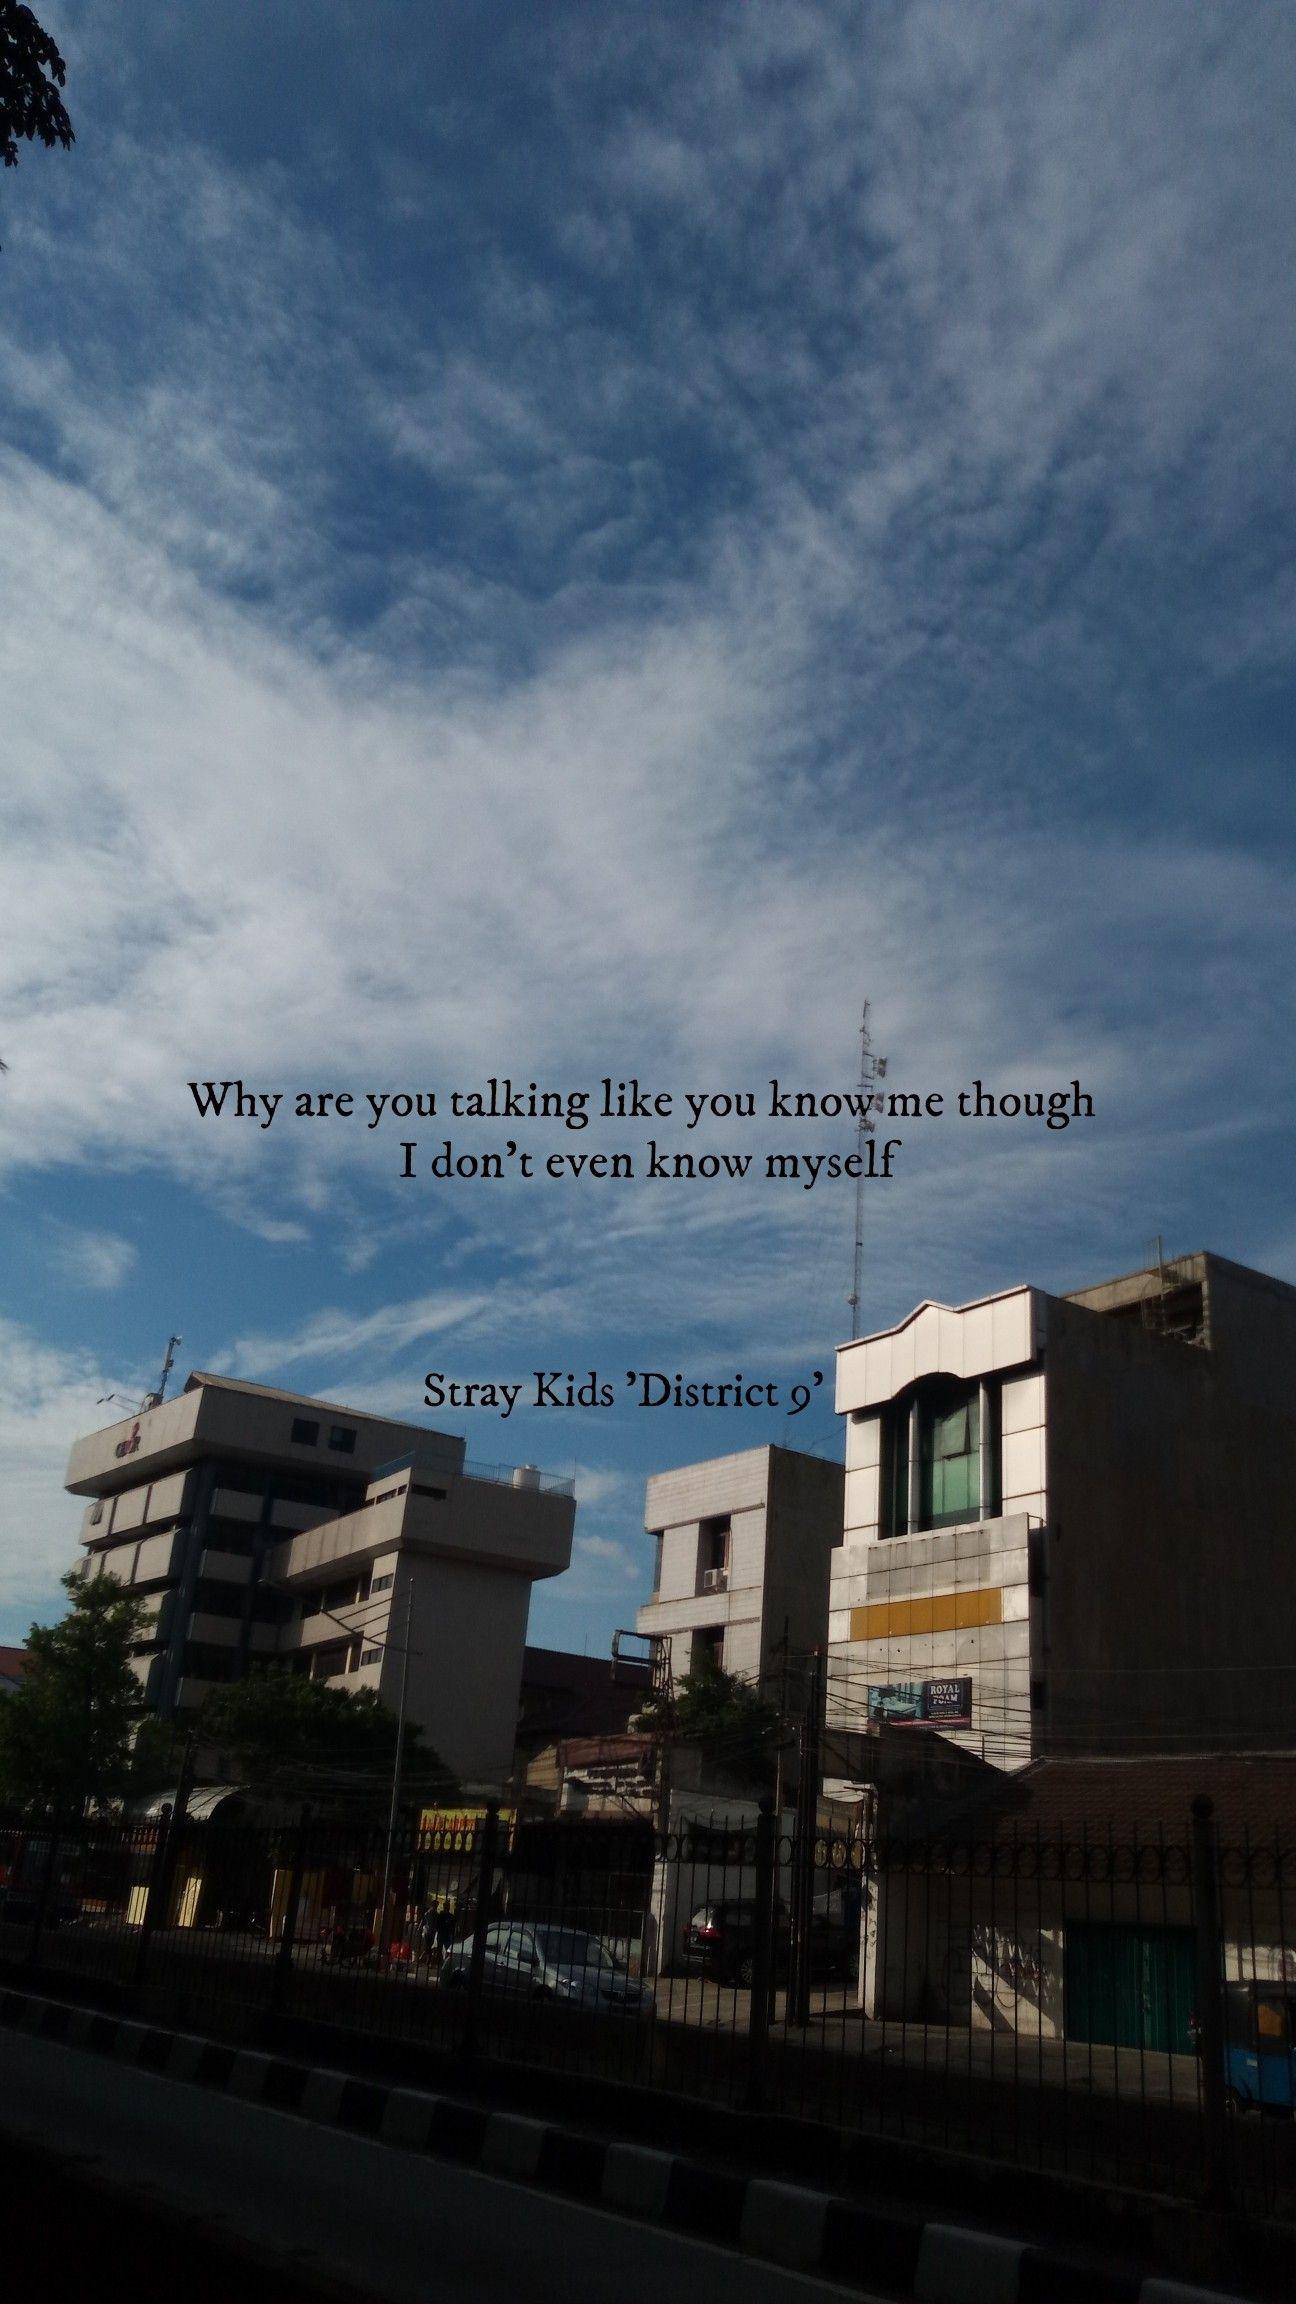 Kpop Lyrics Stray Kids District 9 Kpop Lyrics Straykids Stray